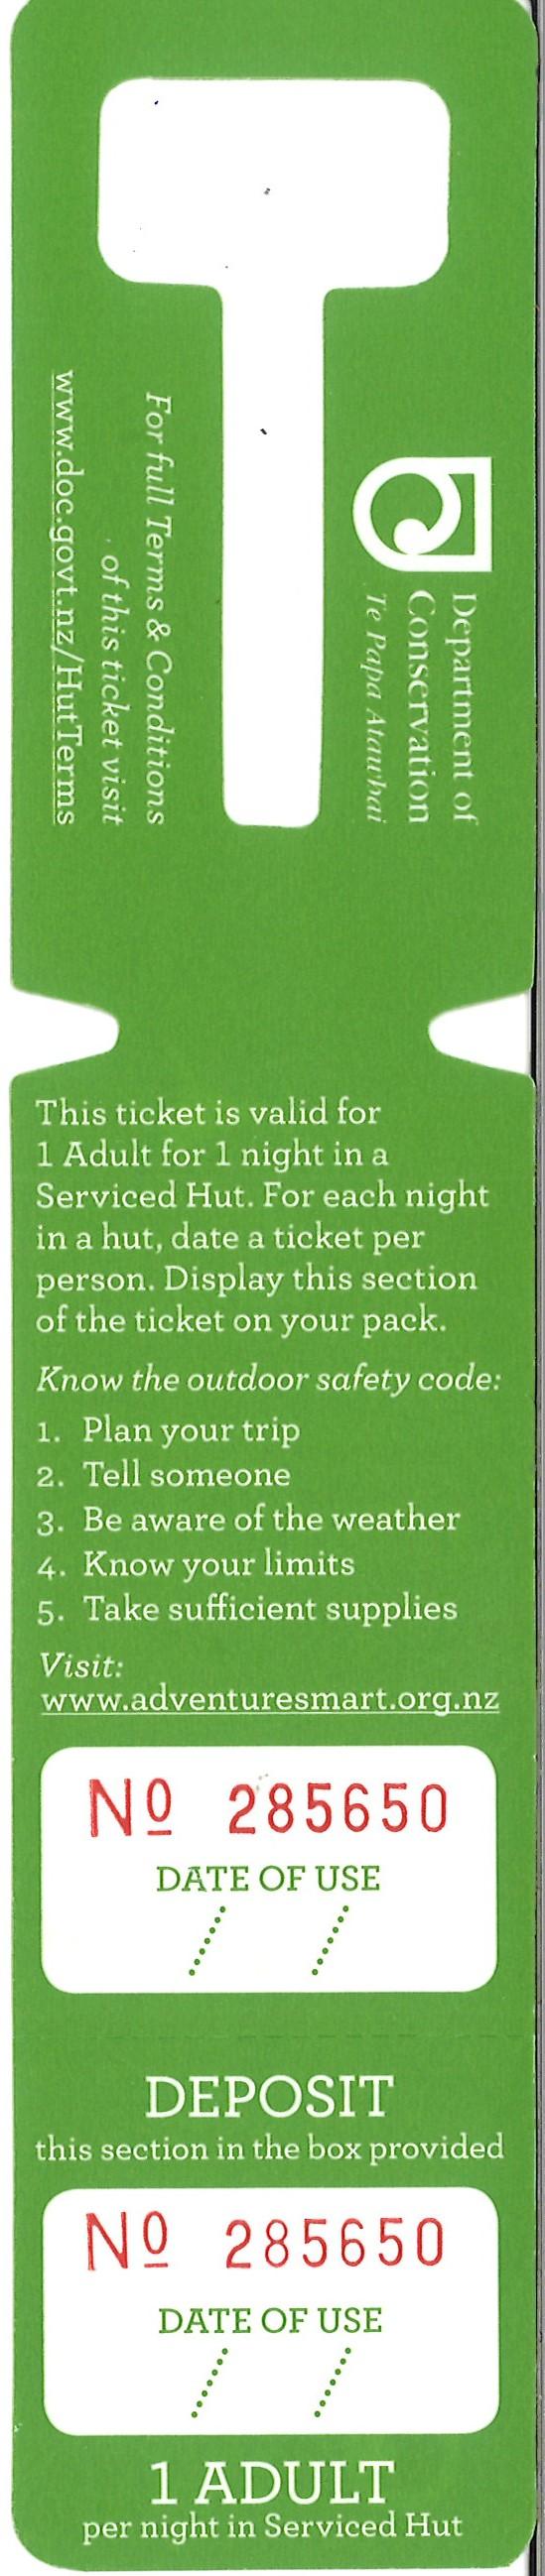 DoC Hut ticket - Serviced Adult